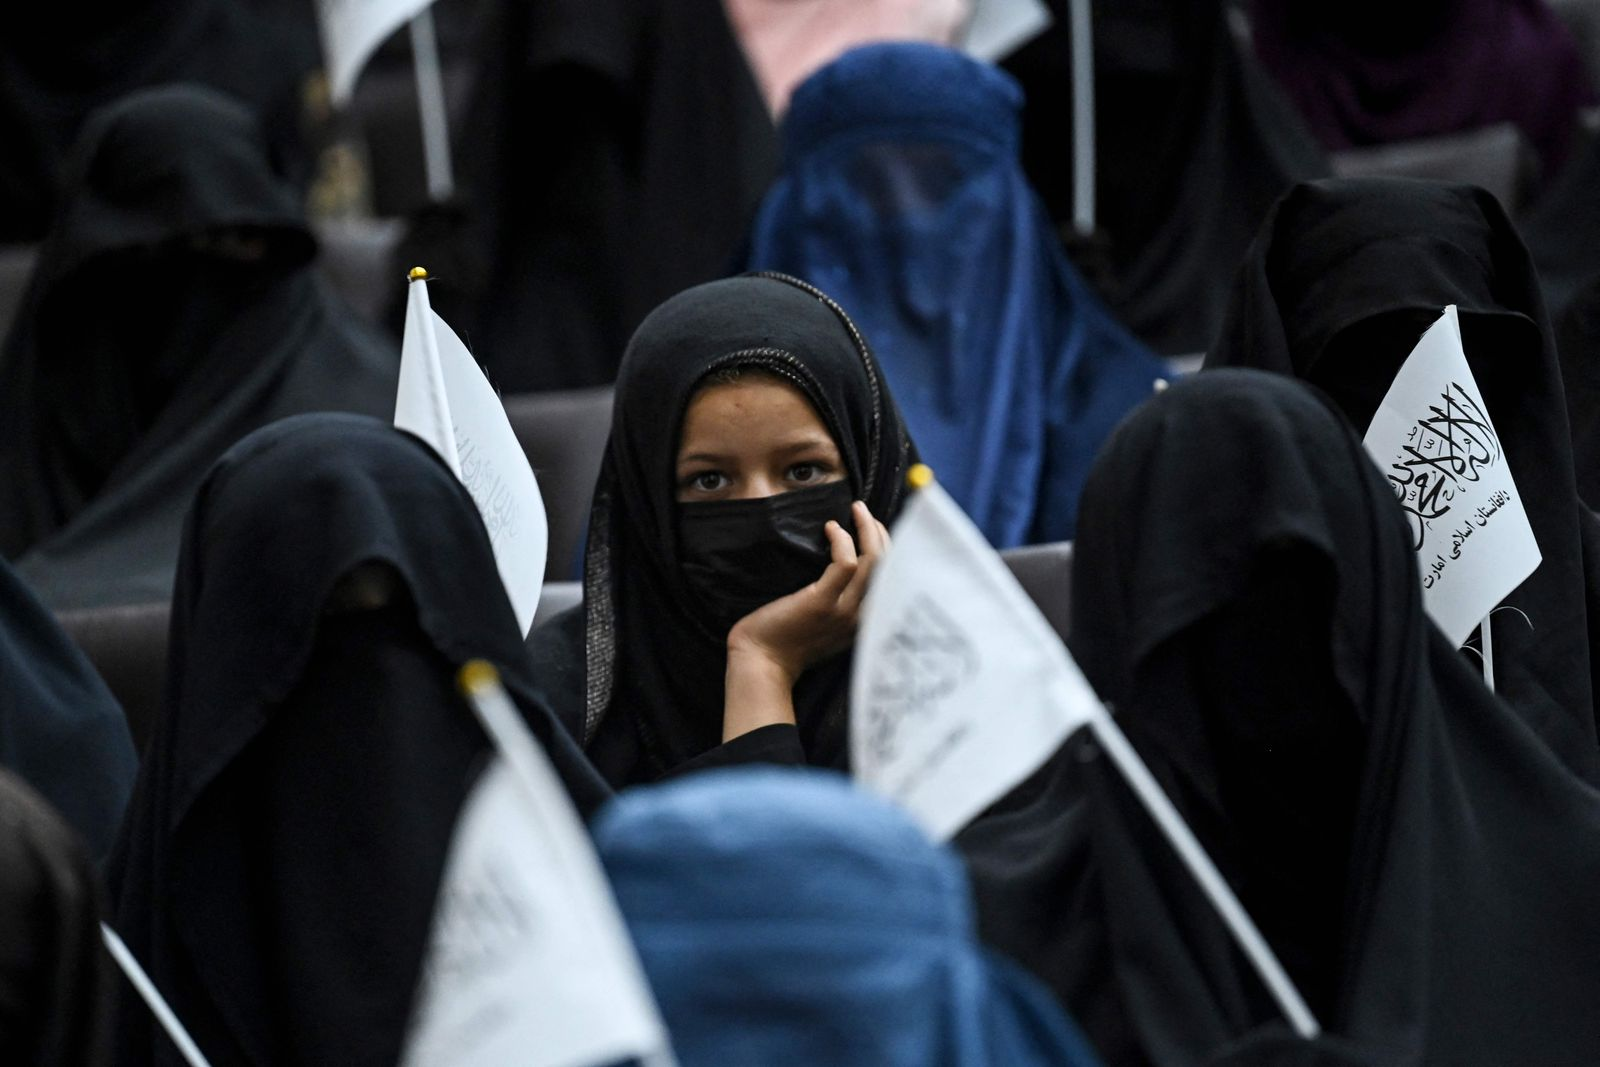 AFGHANISTAN-CONFLICT-DEMONSTRATION-WOMEN